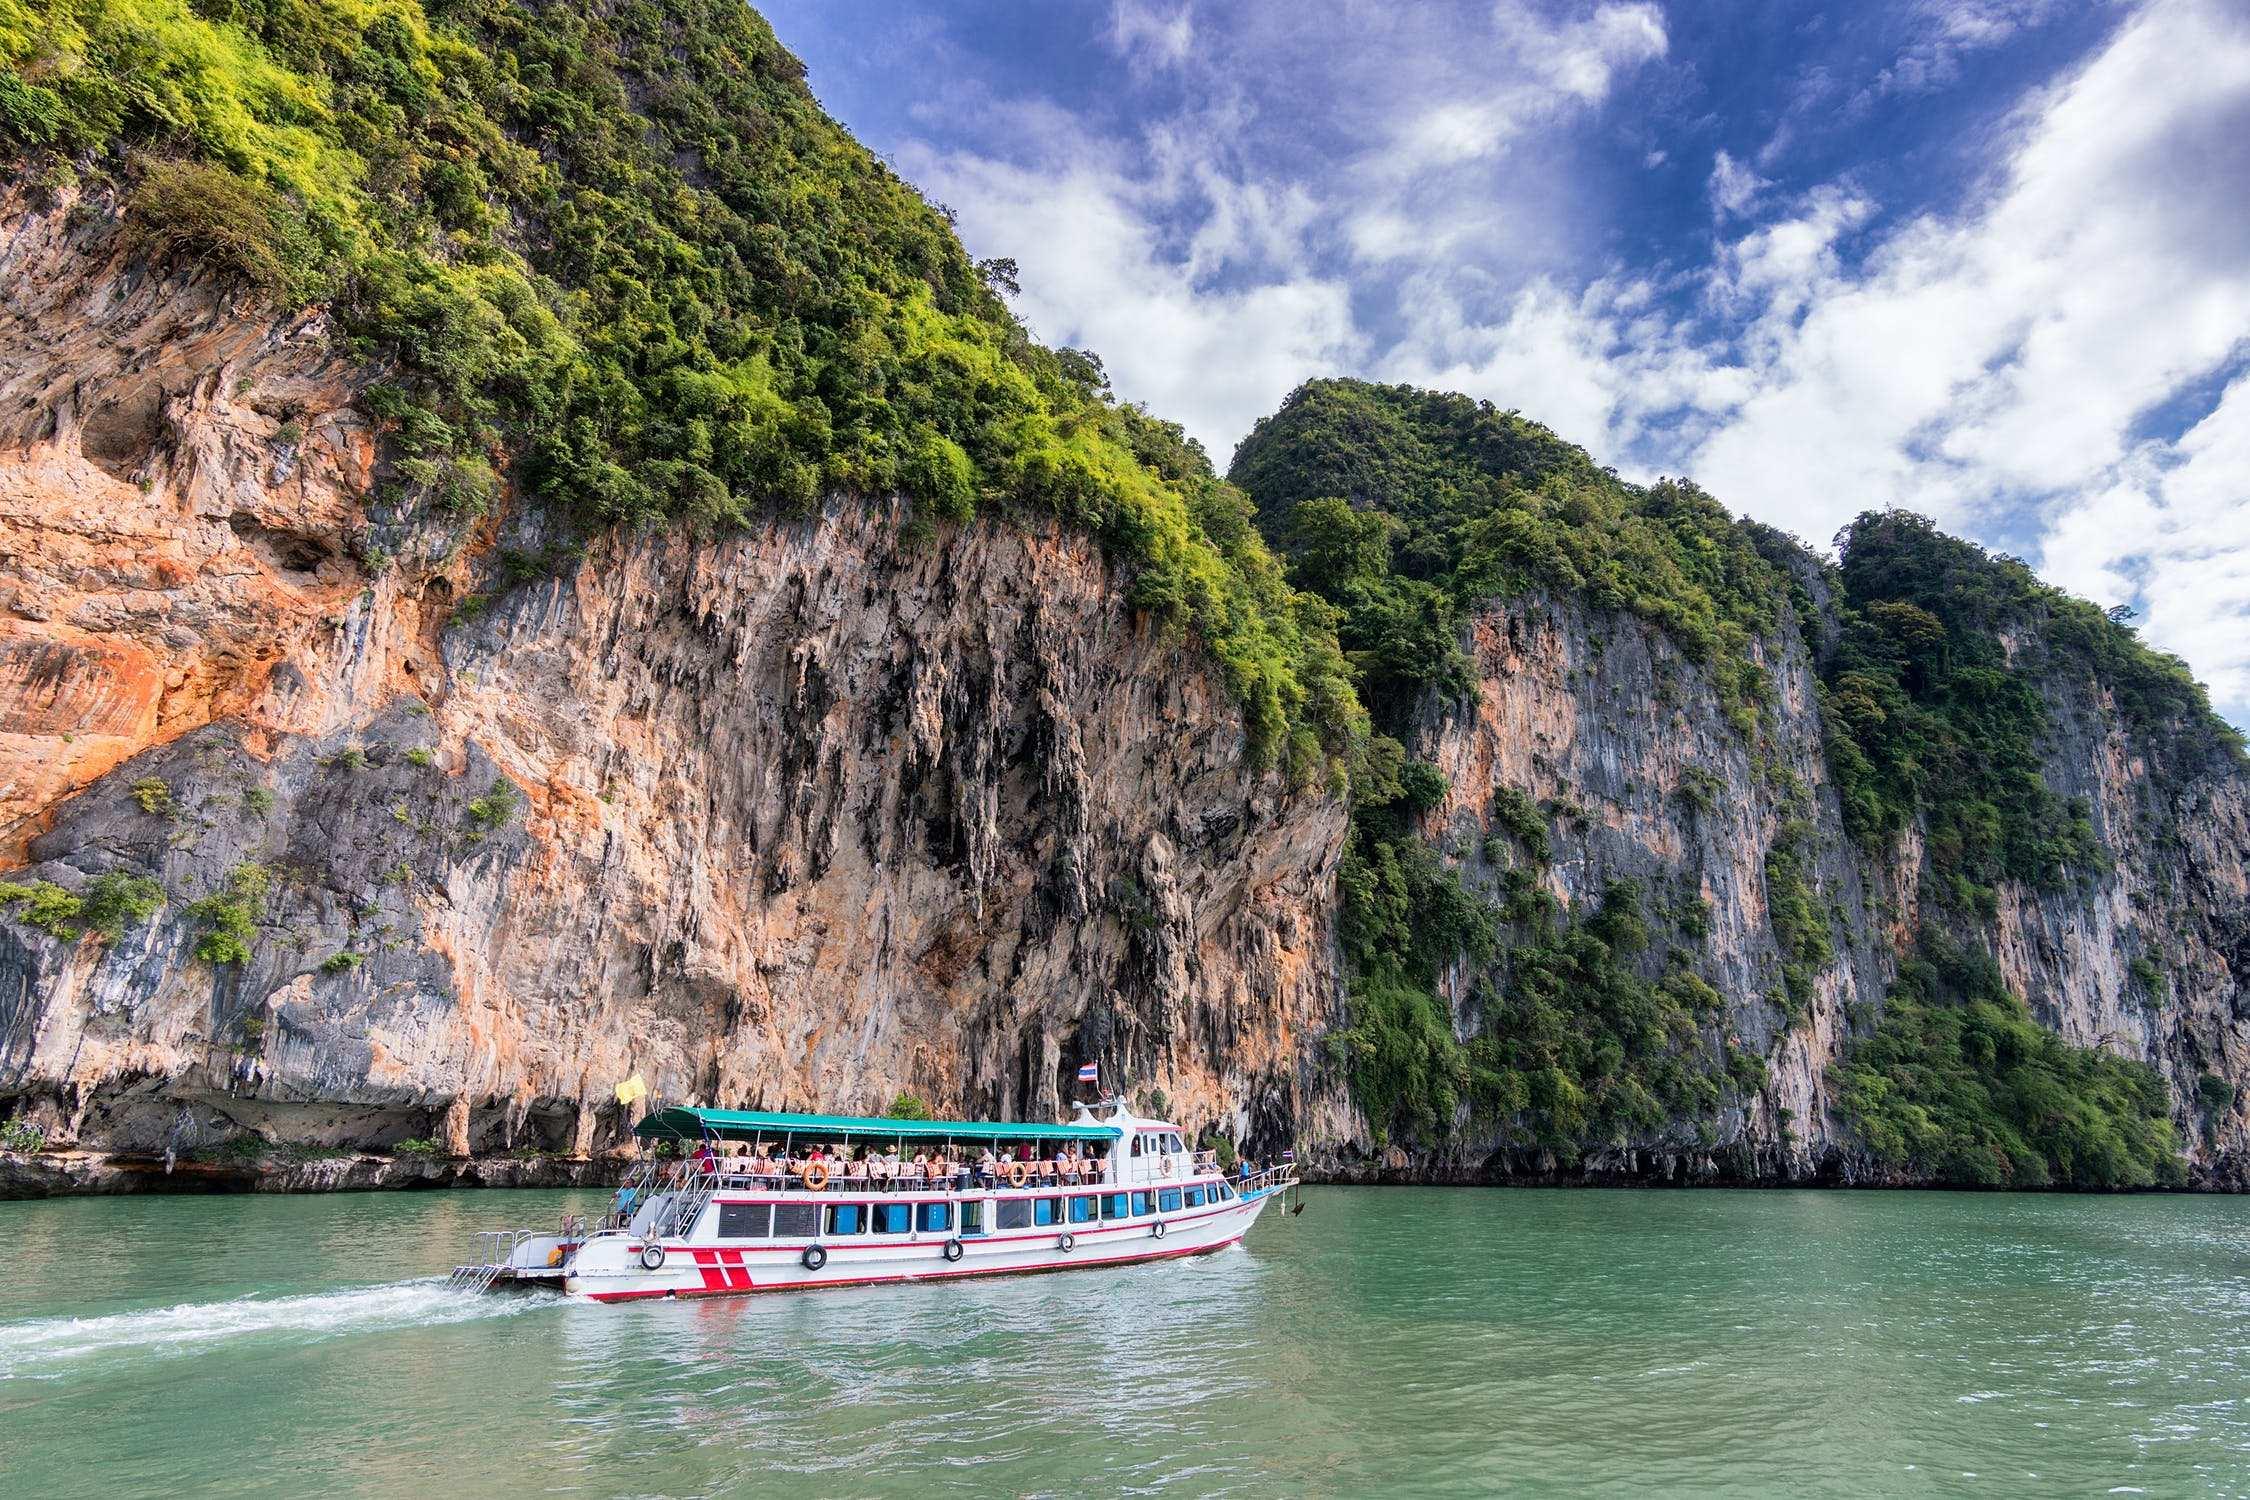 Thailand's rare decline in Tourism